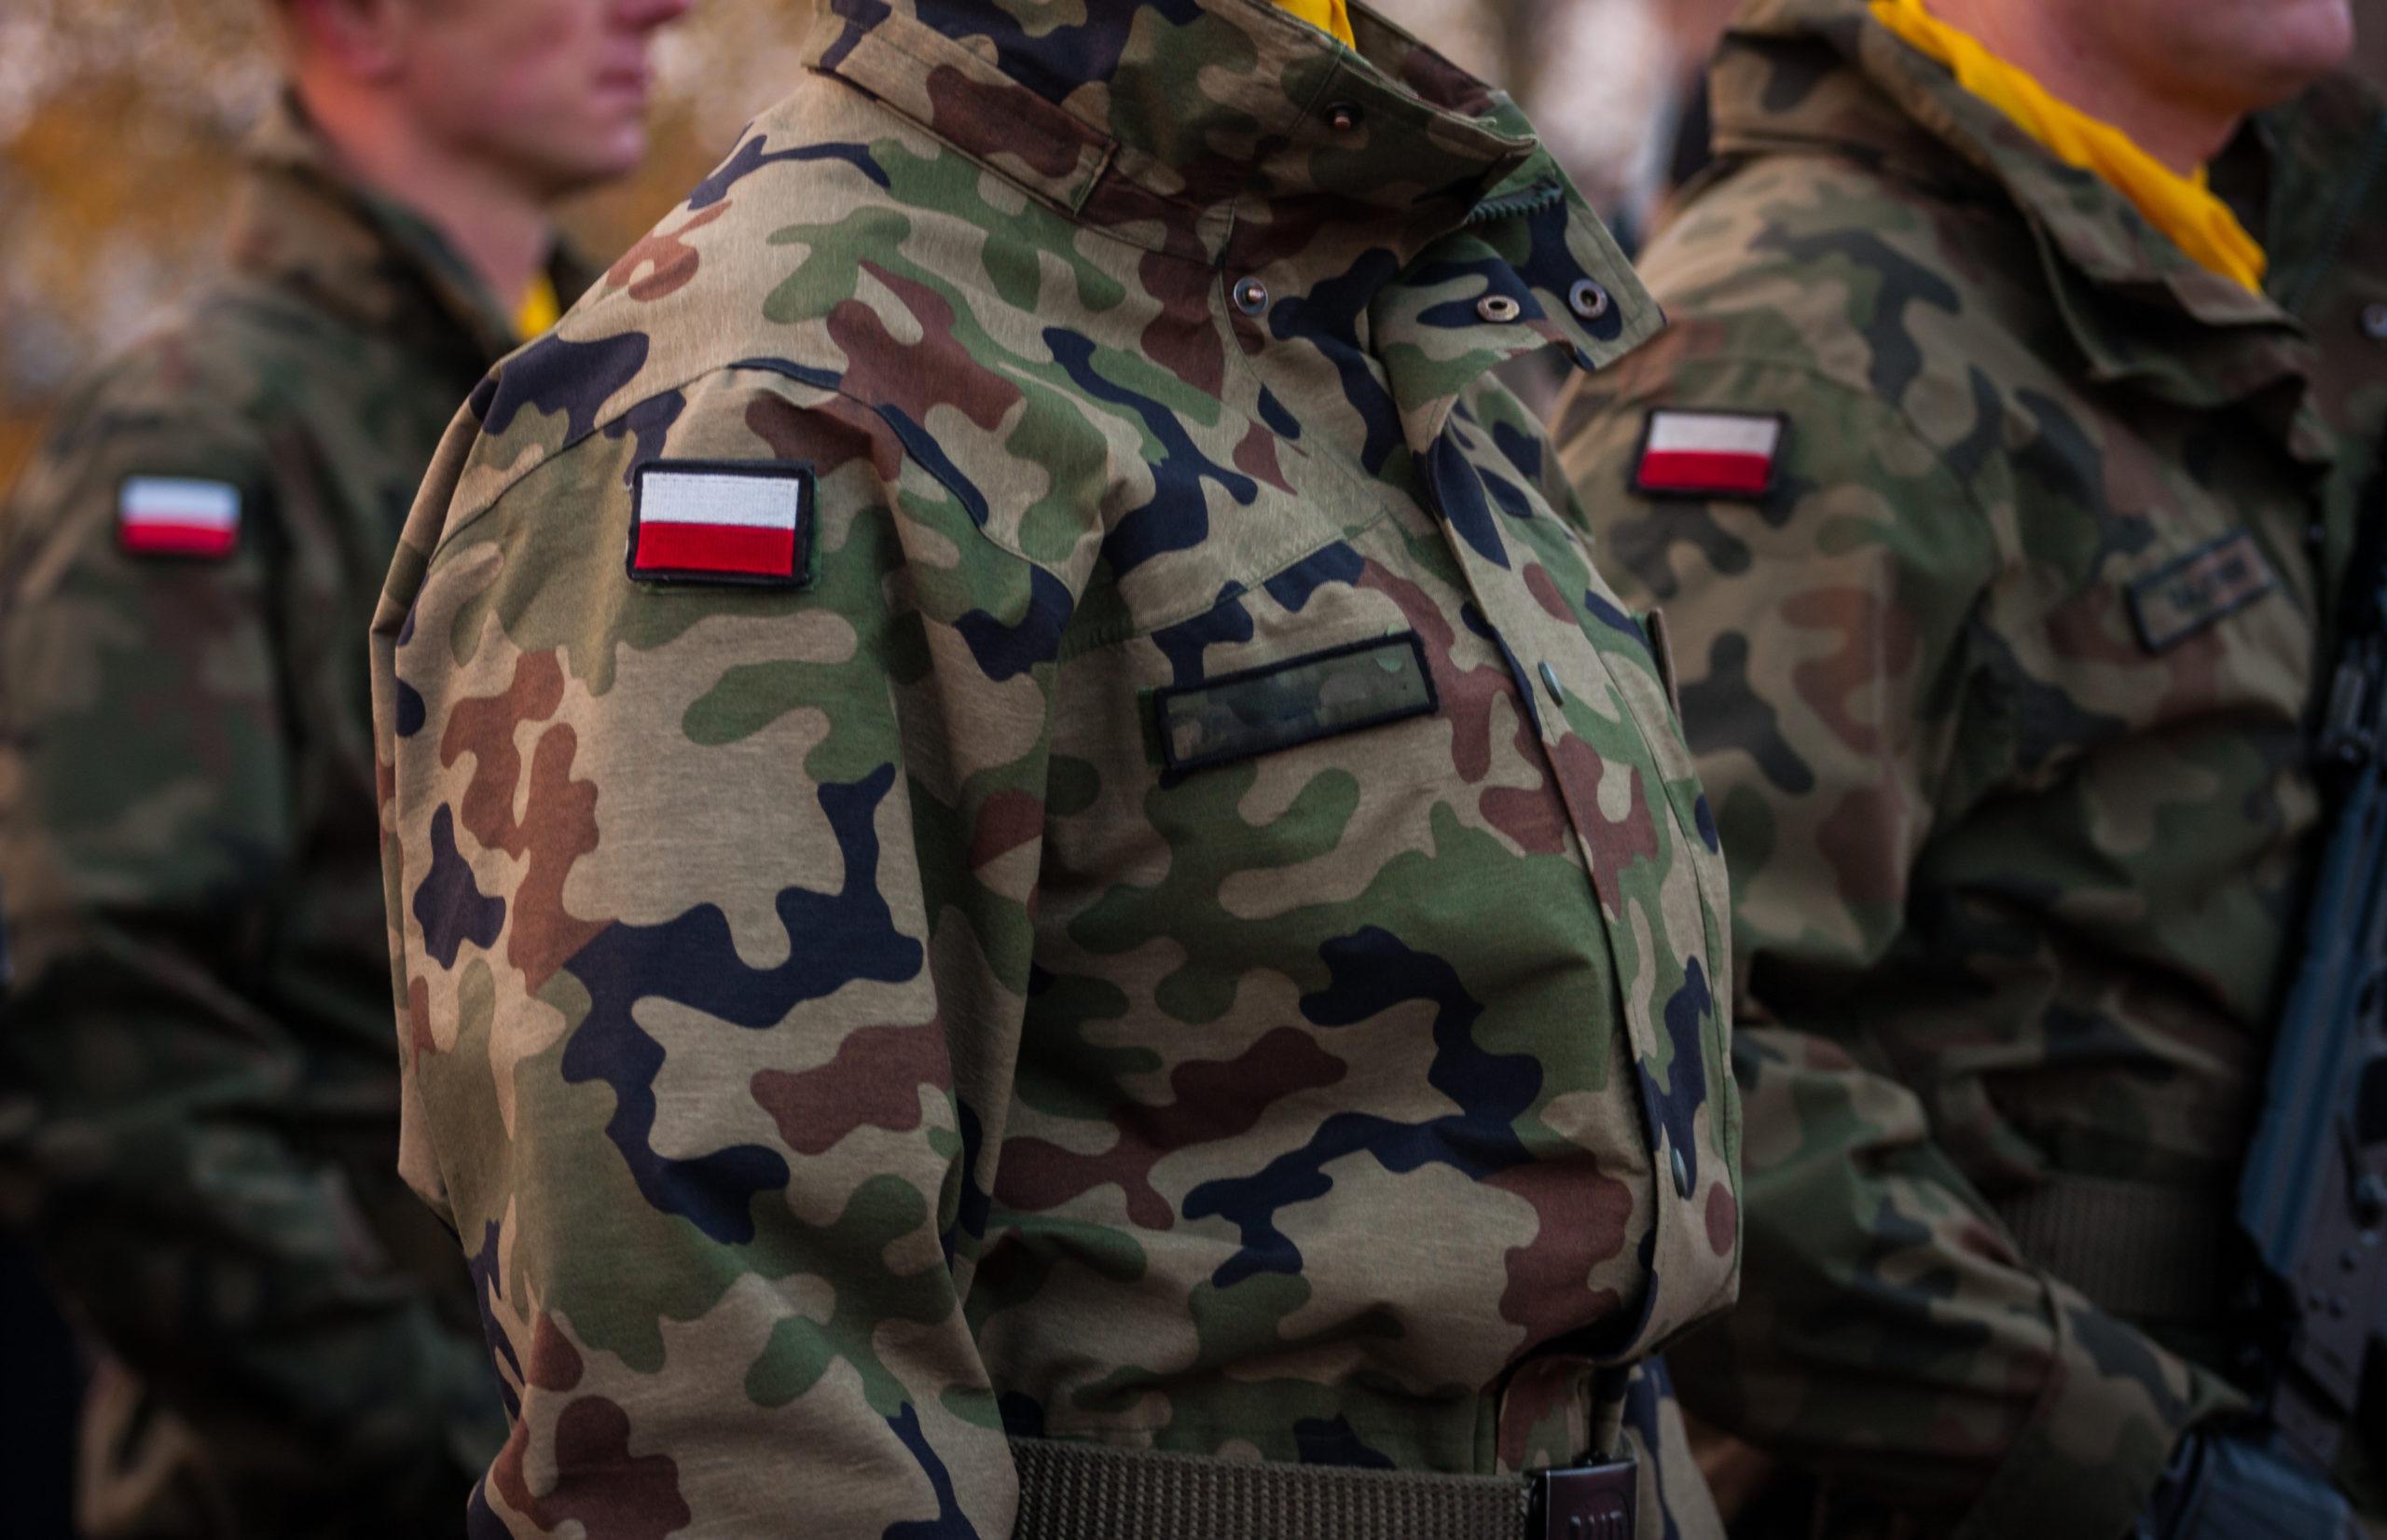 Wojskowa klasa mundurowa. Gdzie kupić mundur?